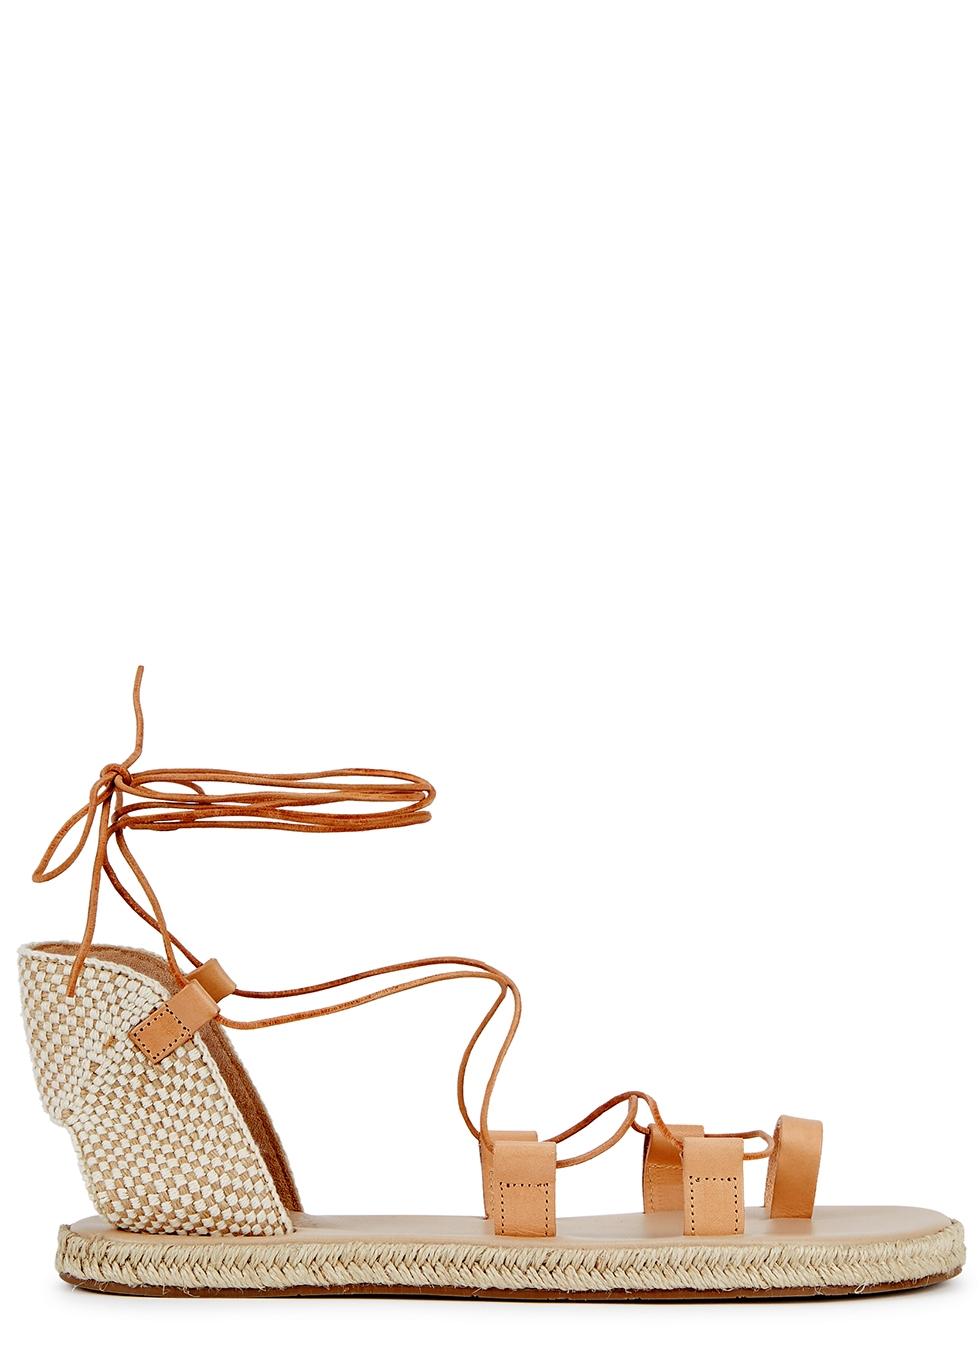 Esmeralda blush leather espadrille sandals